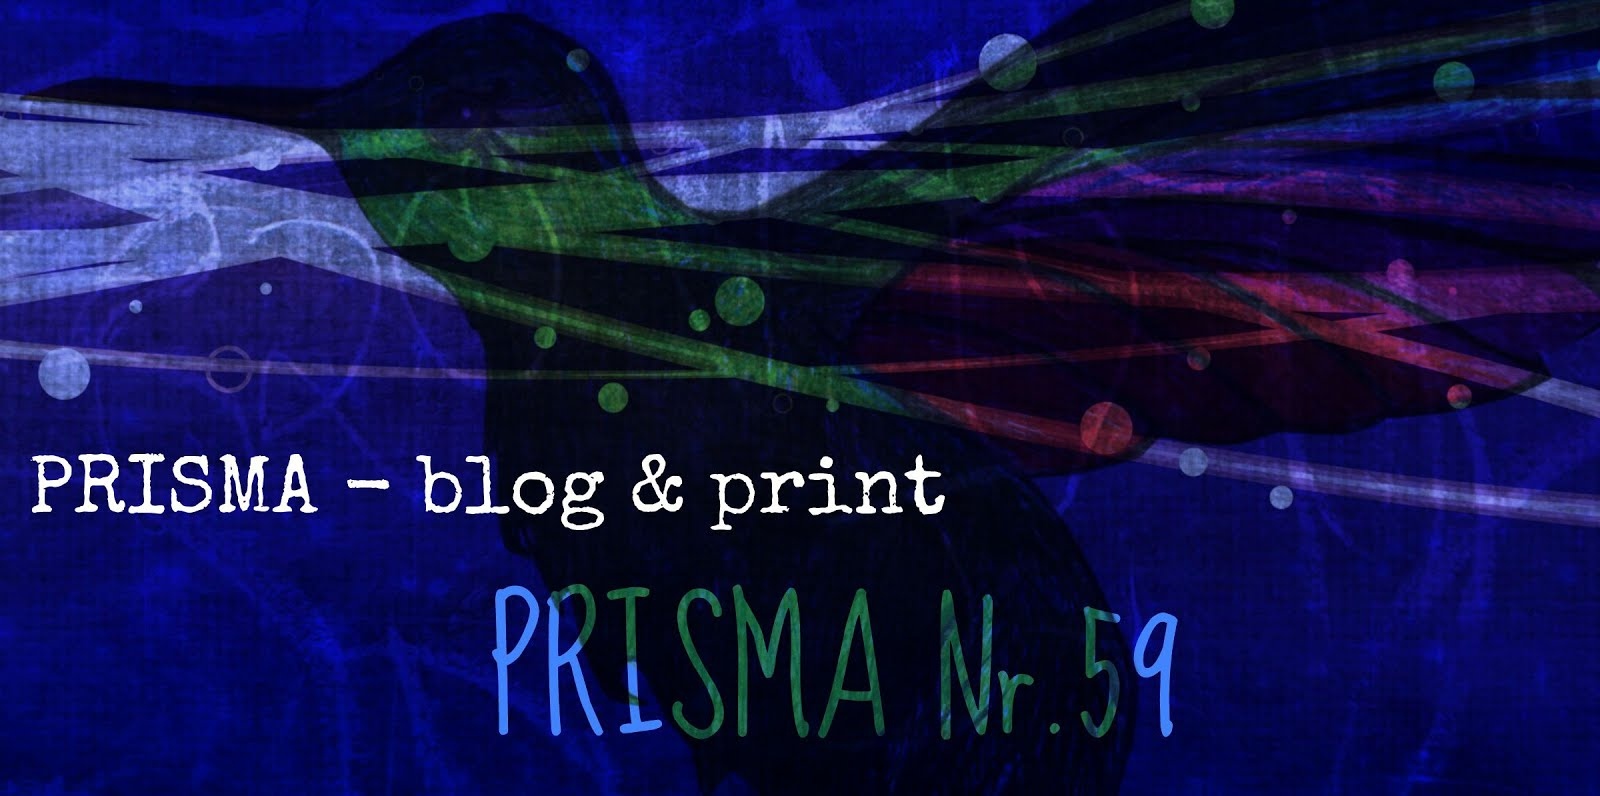 Prisma - blog & print